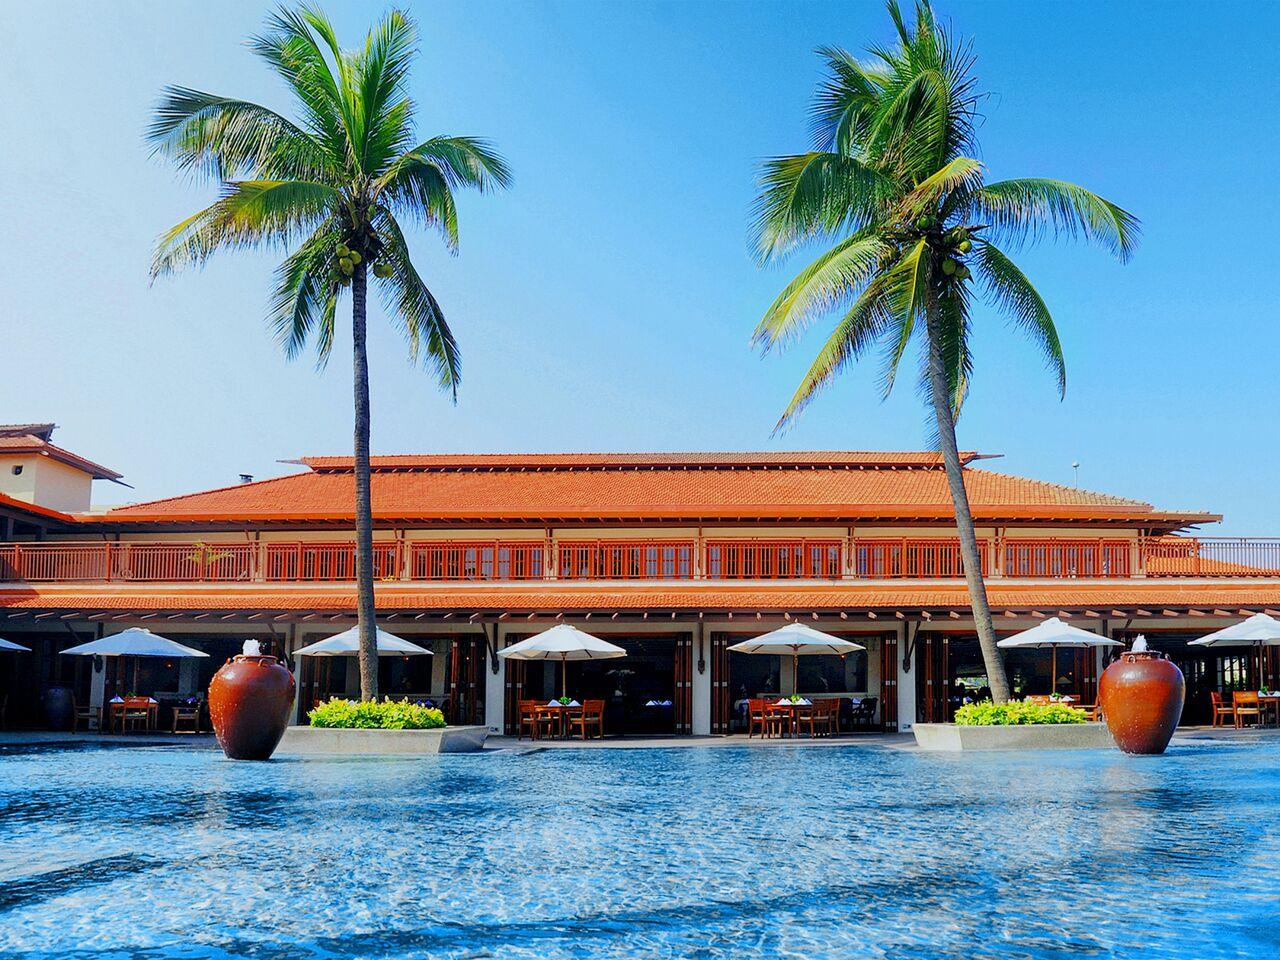 furama resort danang named winner at 2017 world luxury hotel awards